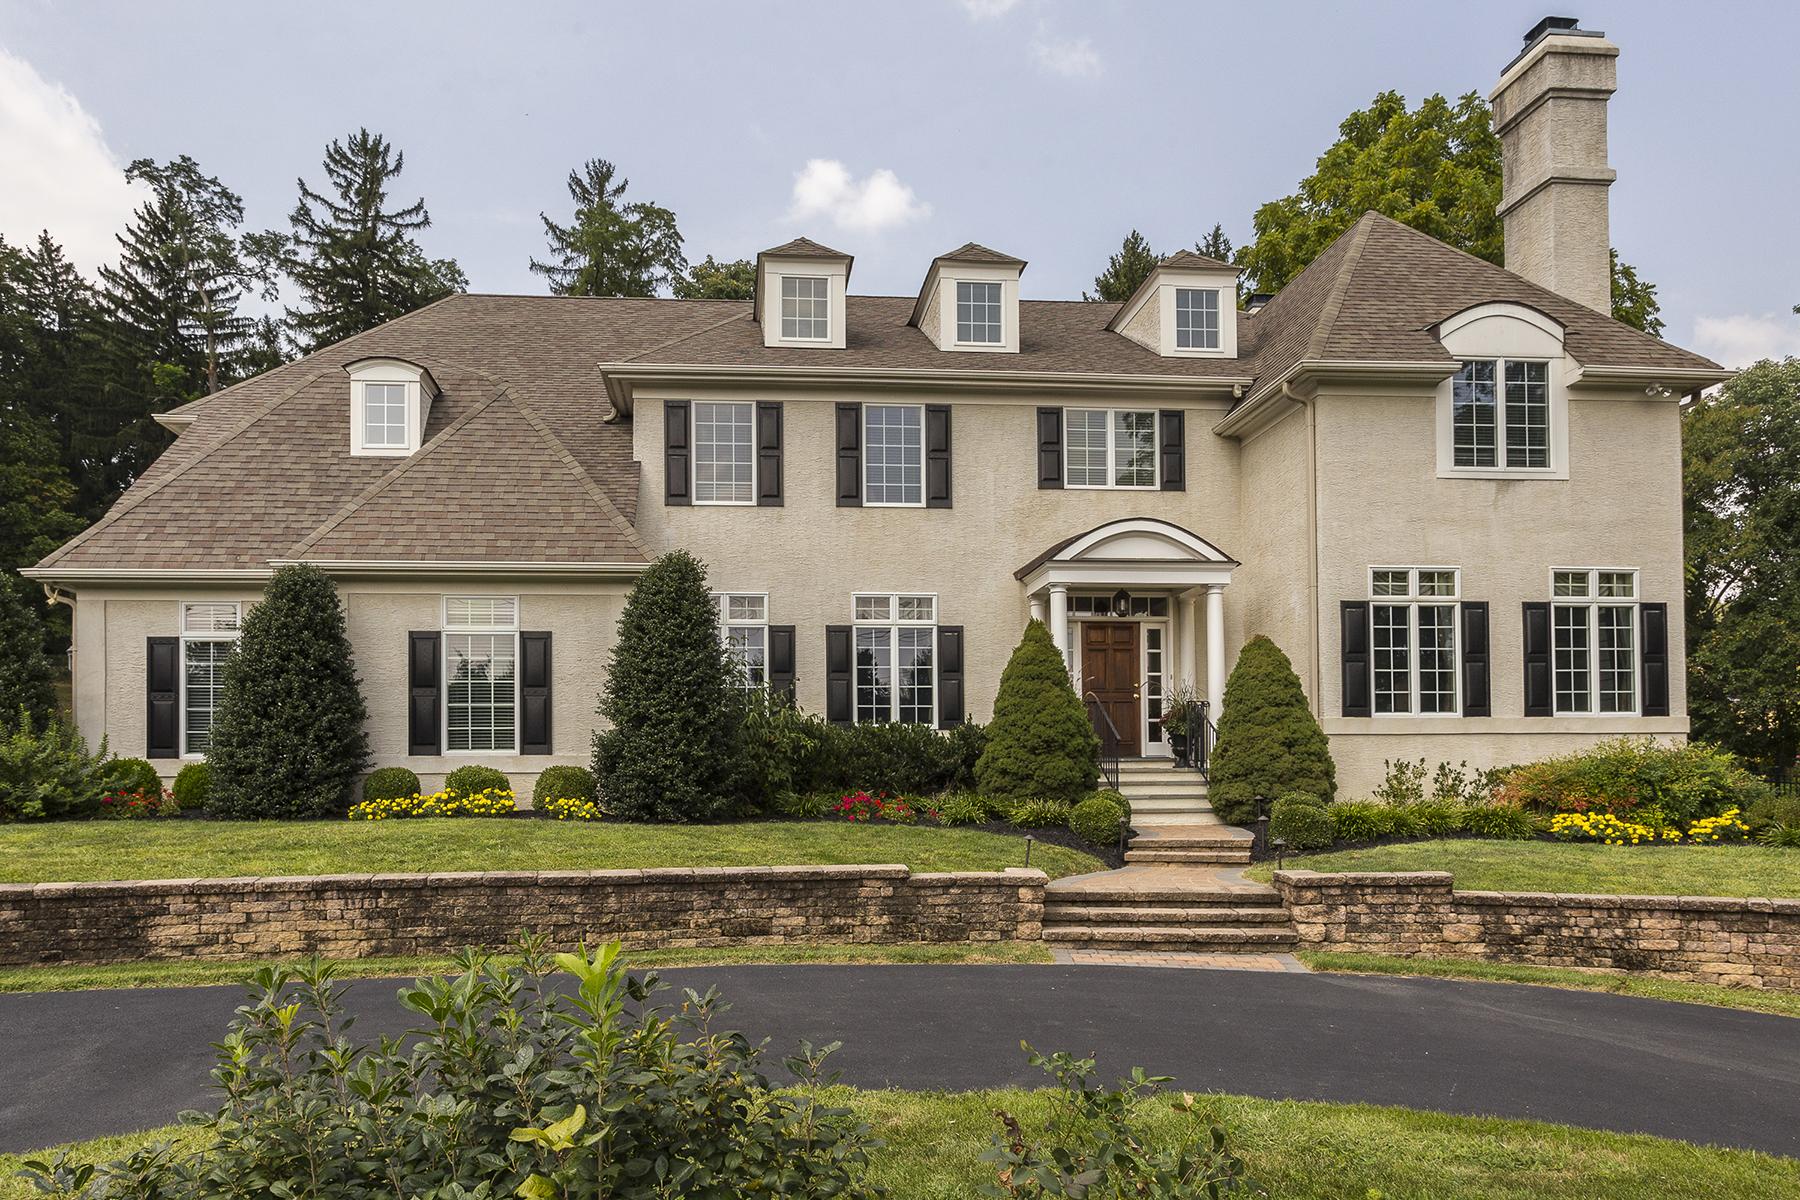 Single Family Home for Sale at Bryn Mawr Manor Home 492 S. Bryn Mawr Ave. Bryn Mawr, Pennsylvania 19010 United States